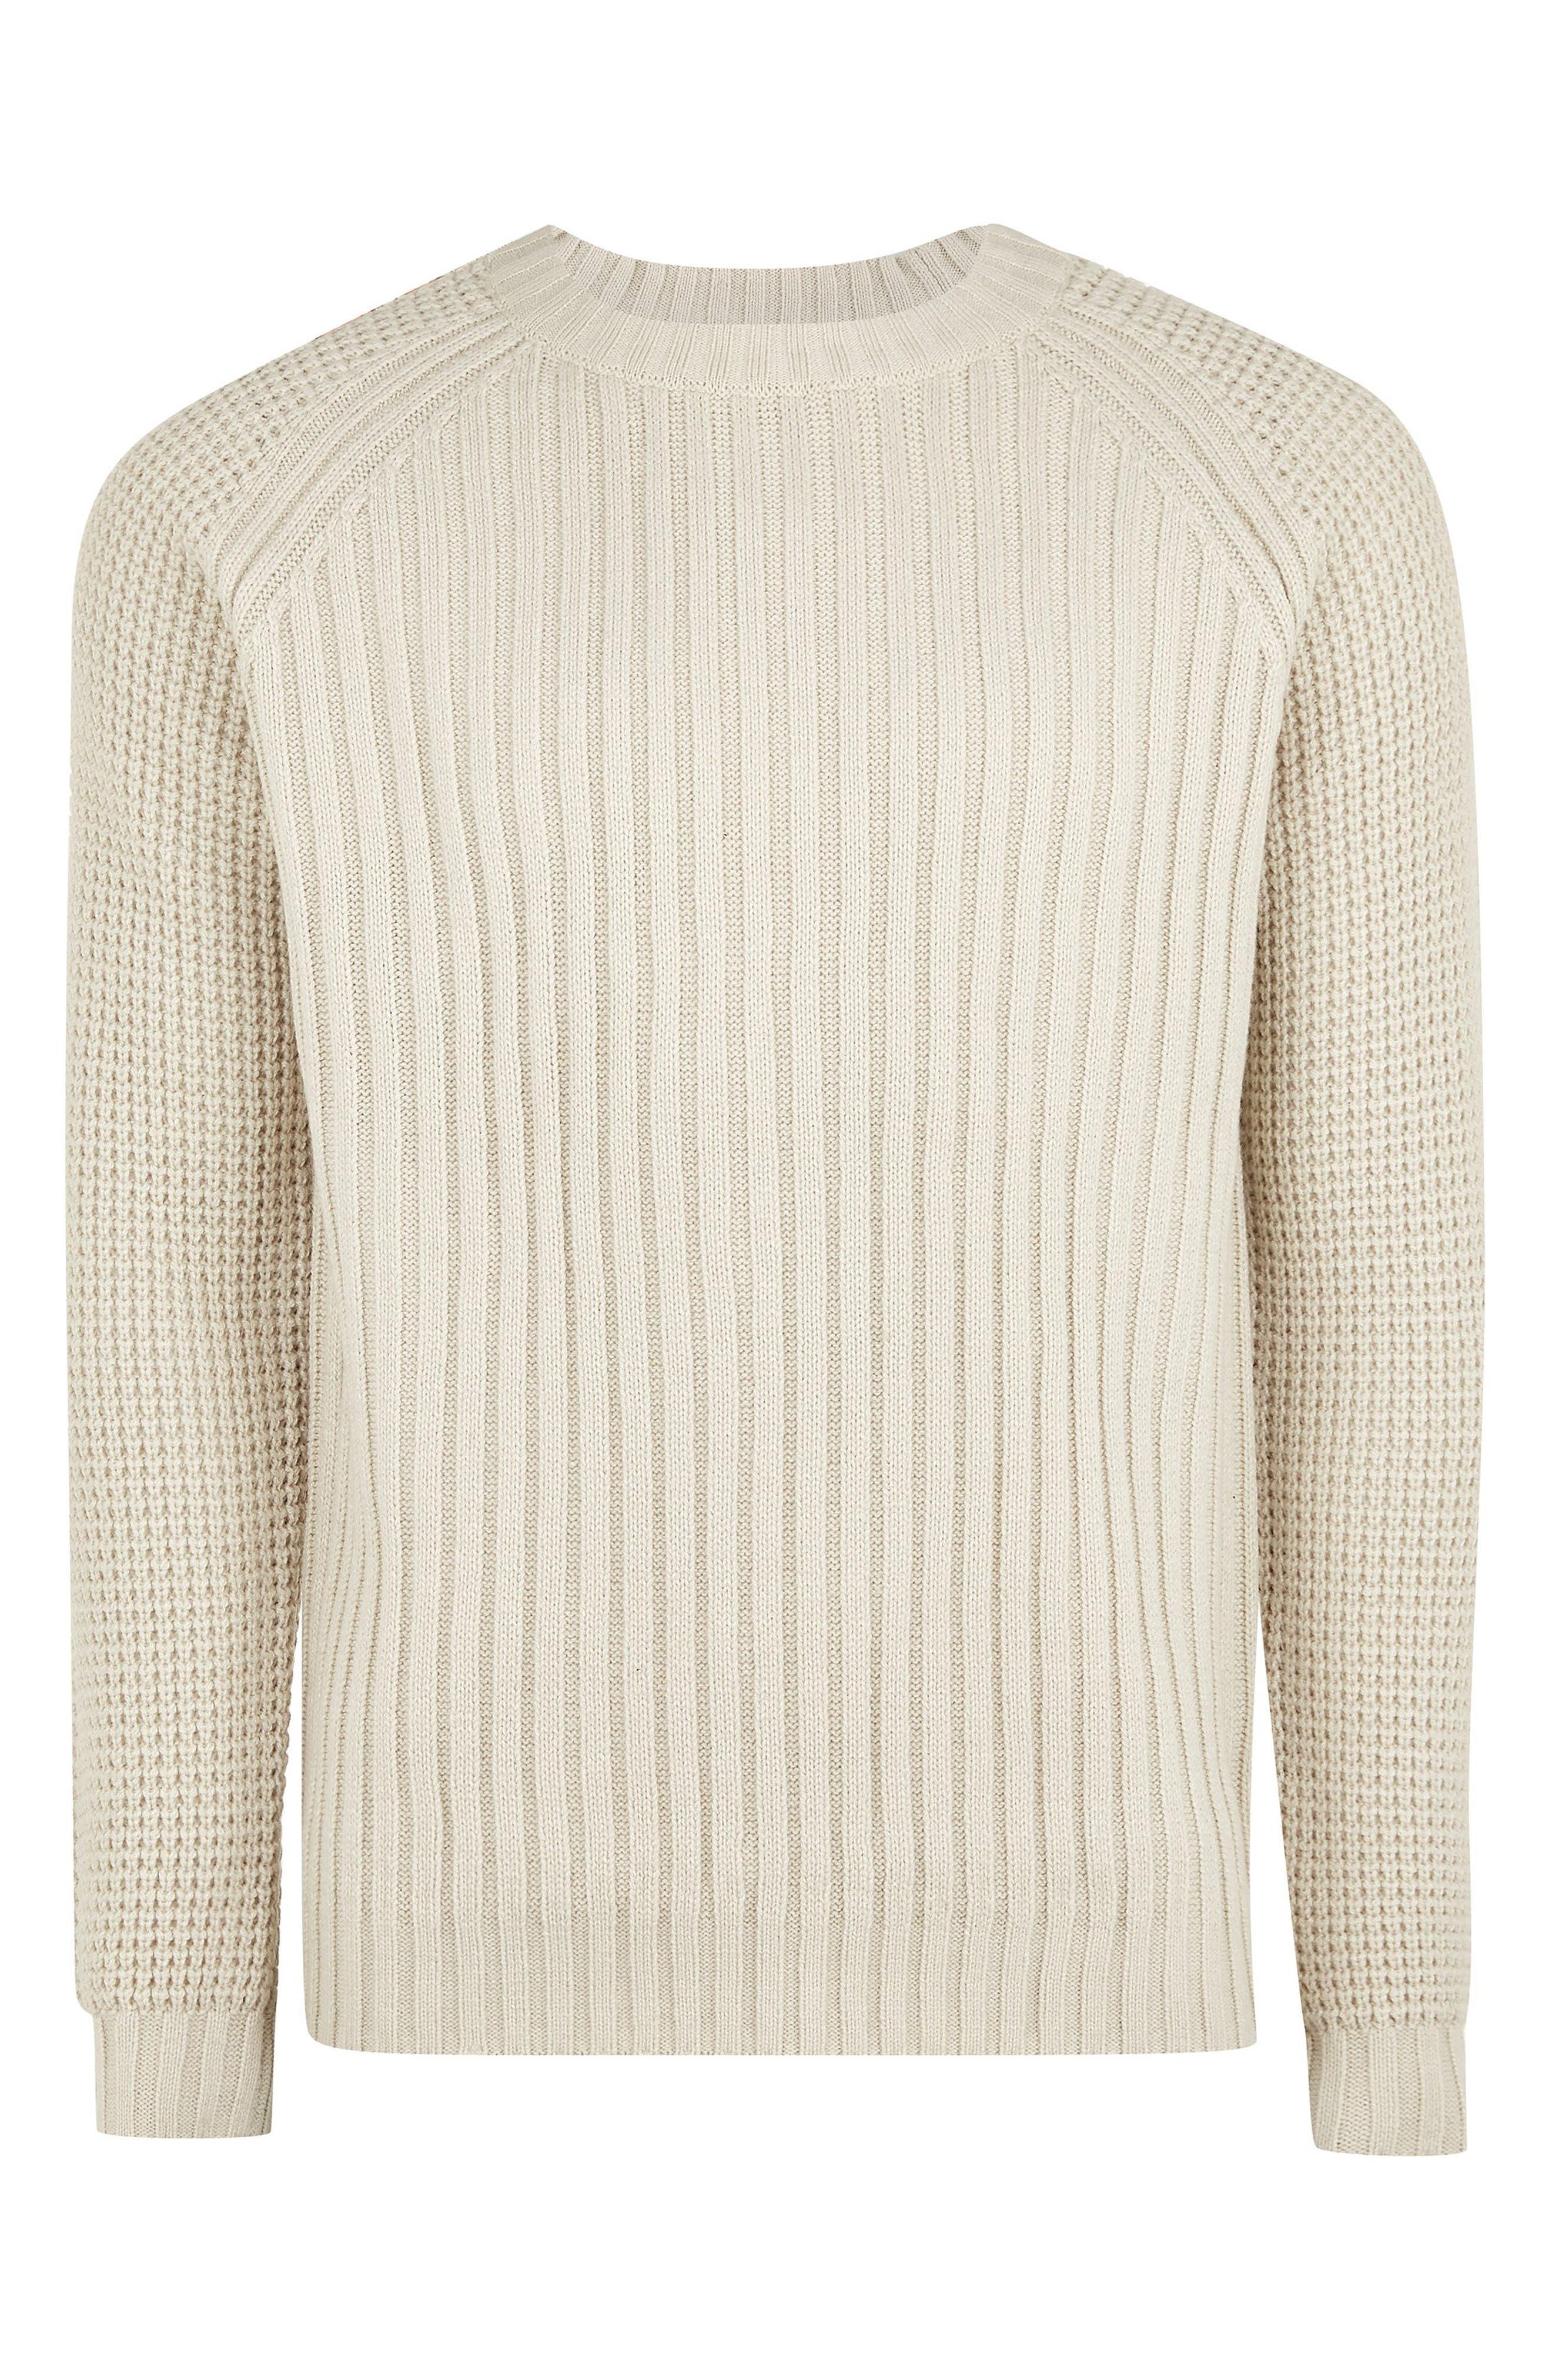 Mixed Stitch Classic Crewneck Sweater,                             Alternate thumbnail 4, color,                             STONE